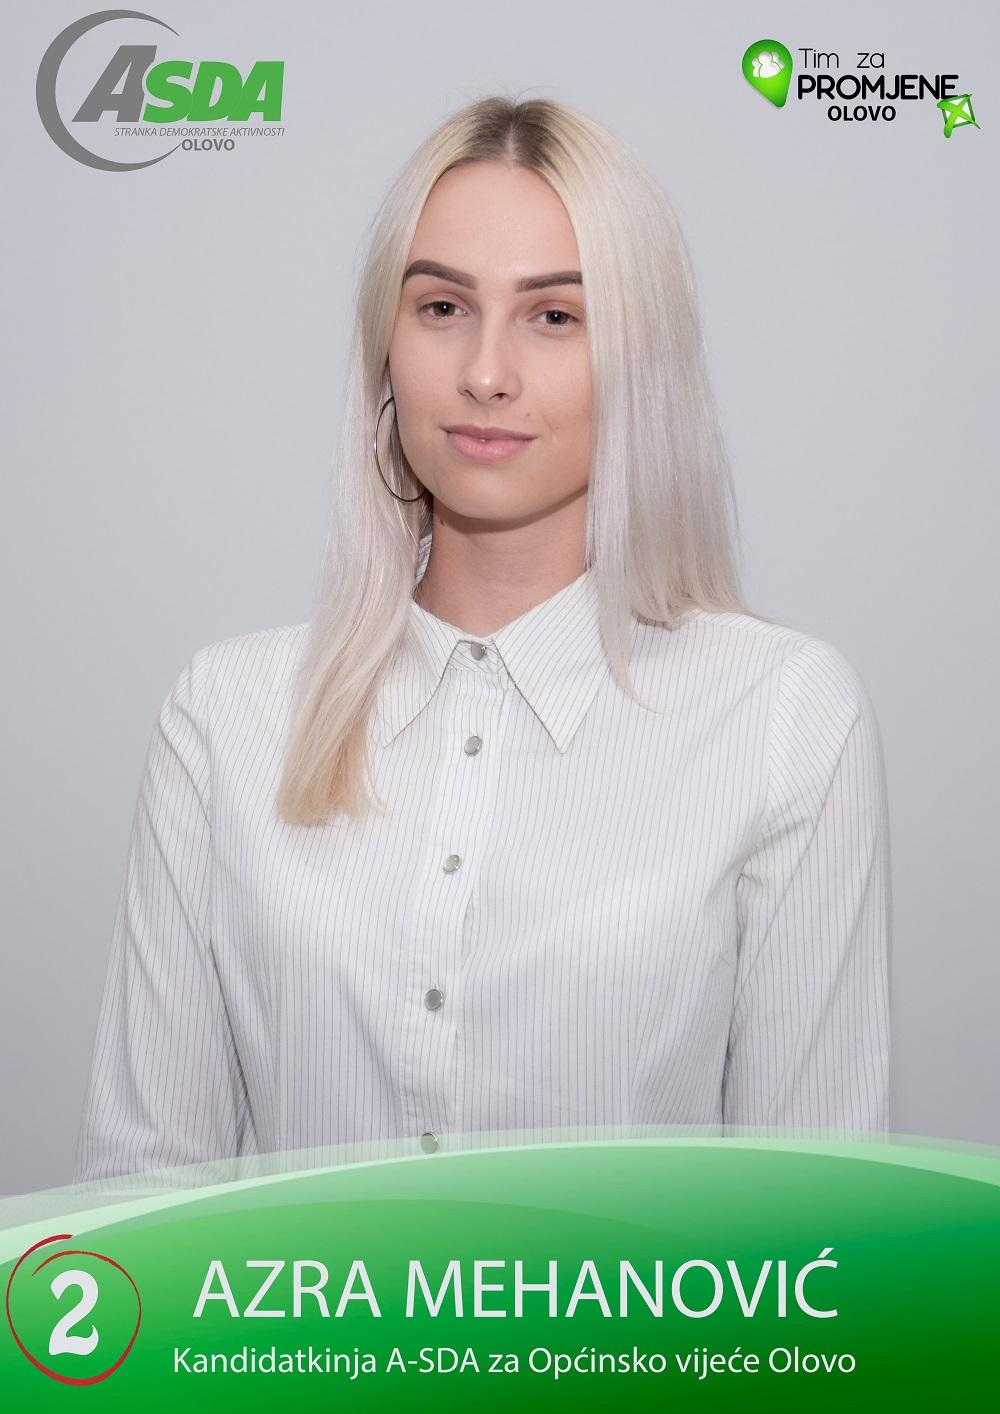 Azra Mehanović